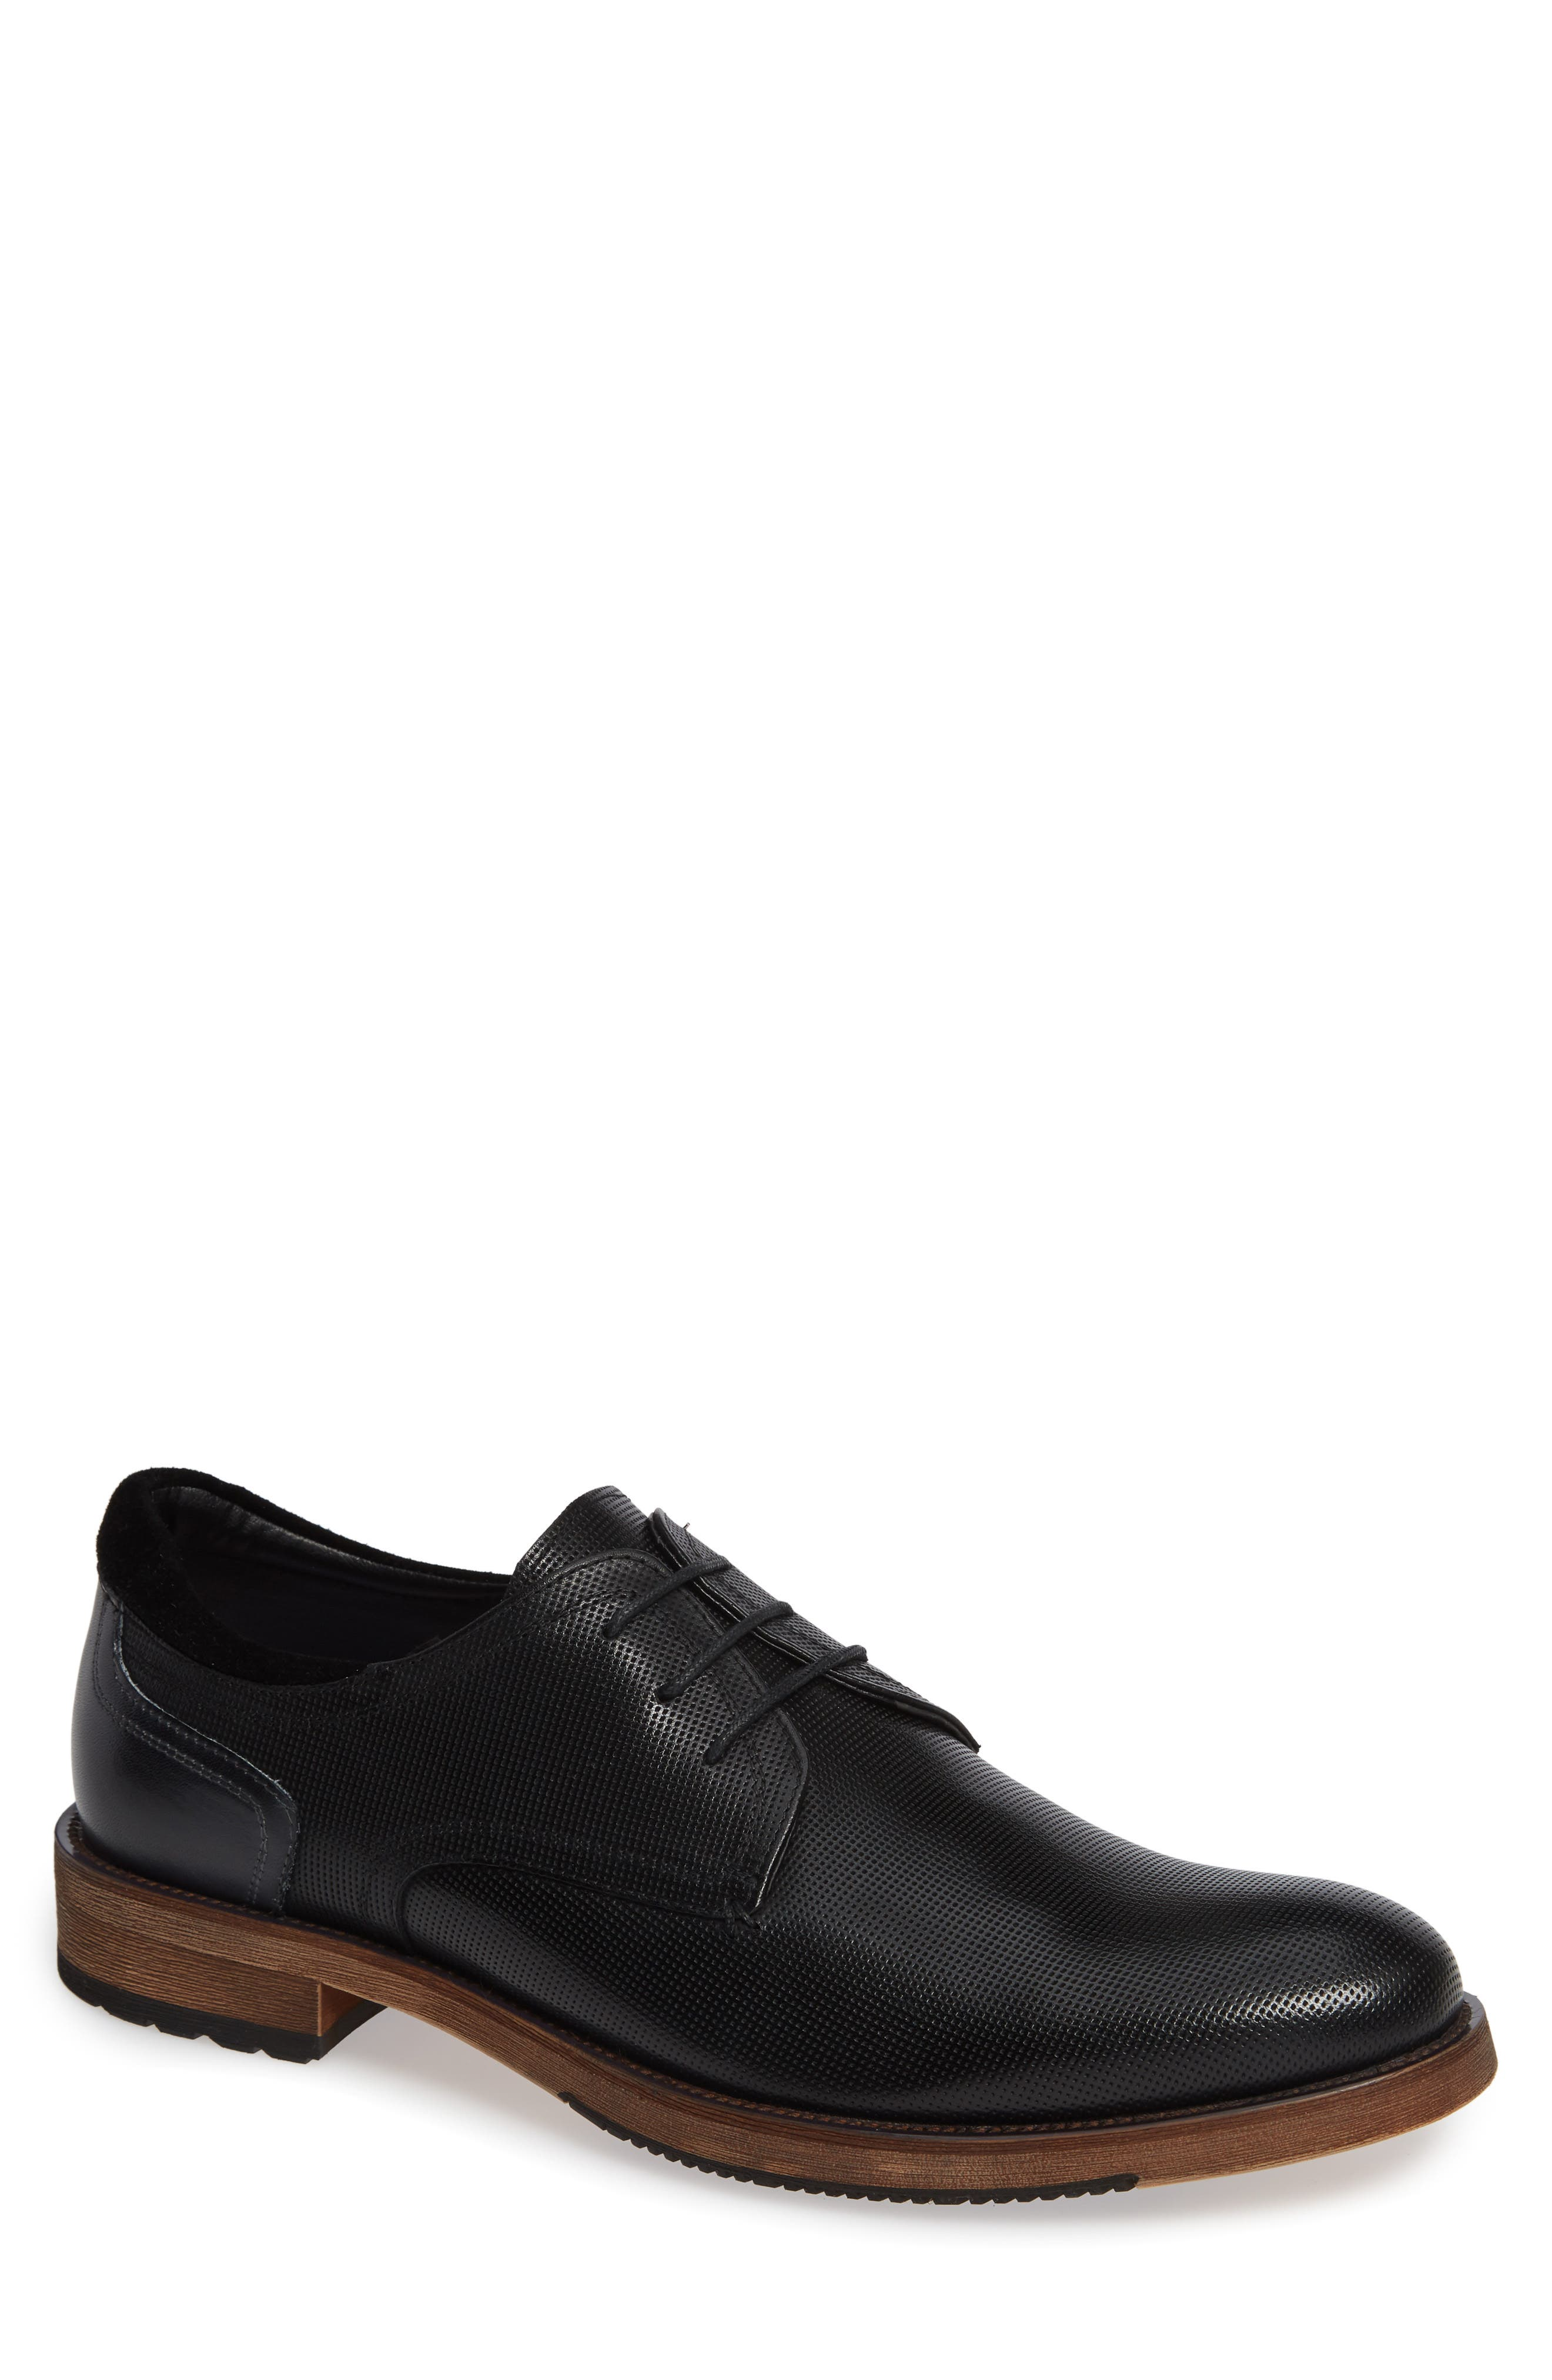 Durham Textured Plain Toe Derby,                             Main thumbnail 1, color,                             BLACK